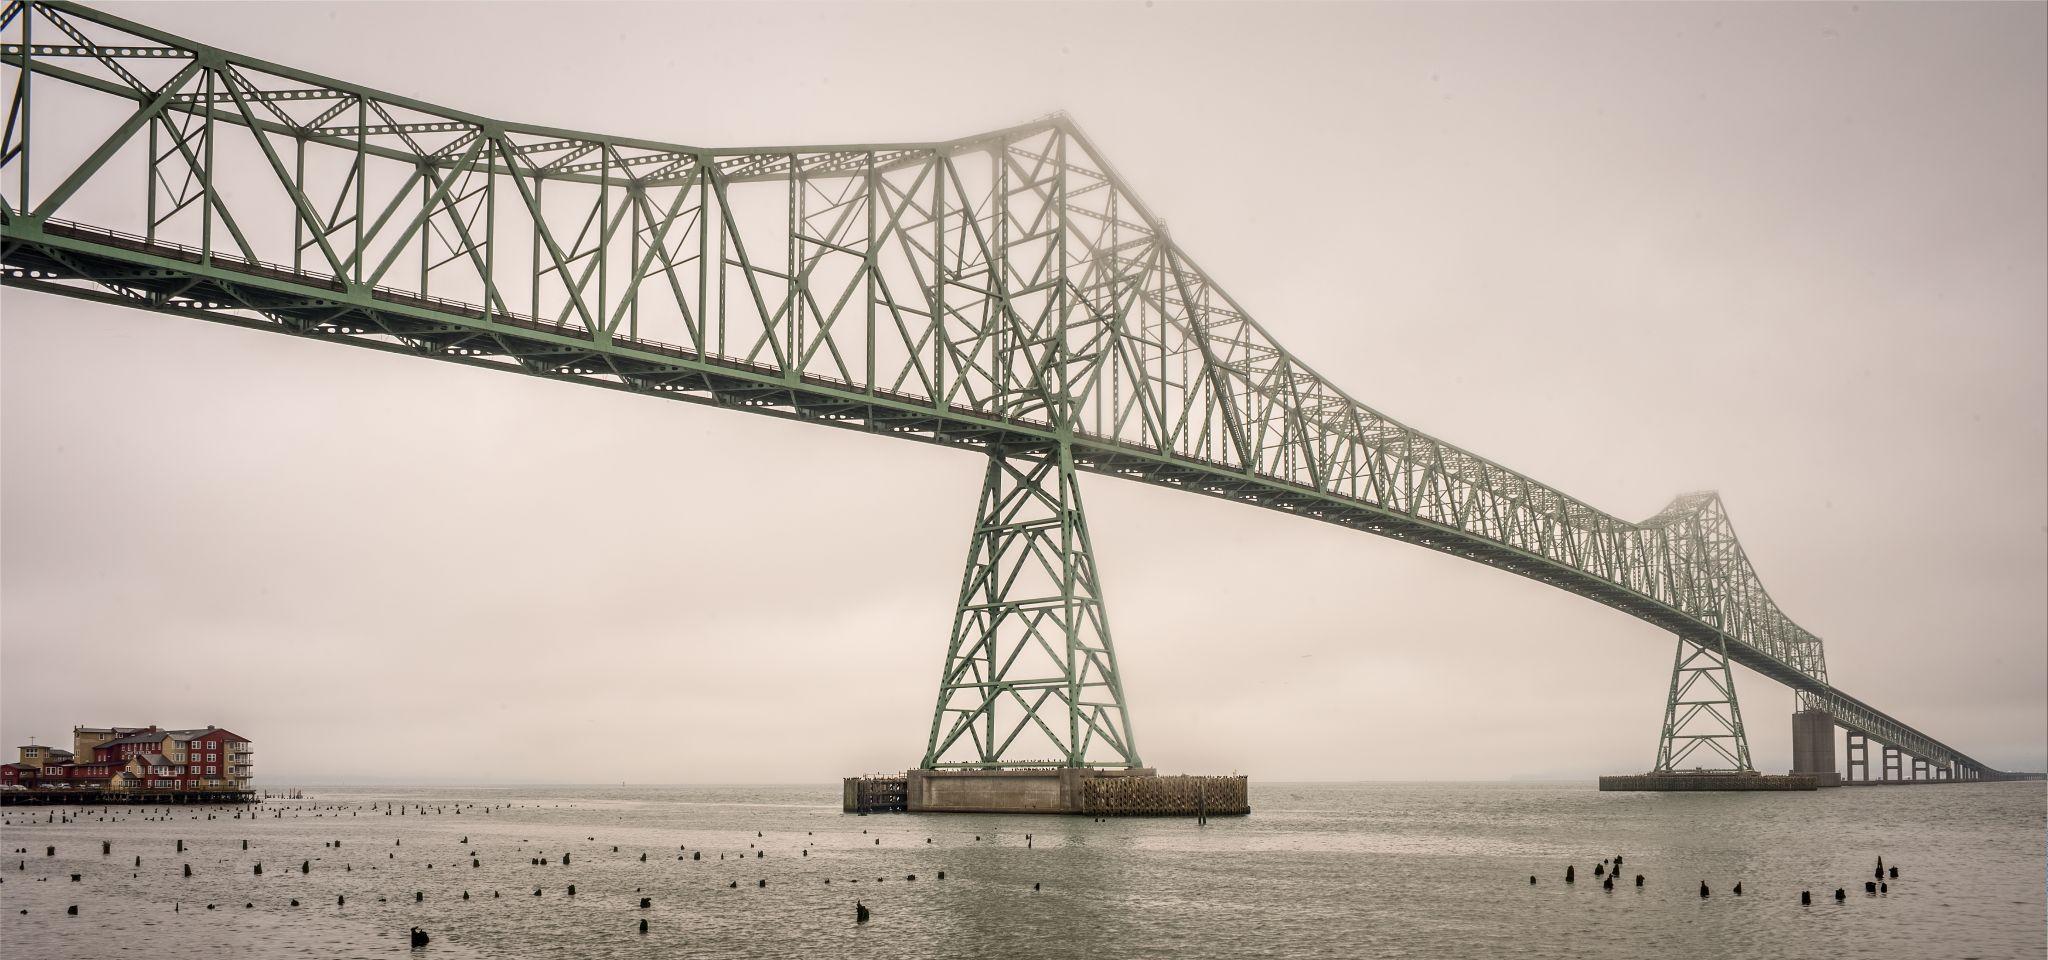 Astoria-Megler Bridge, USA